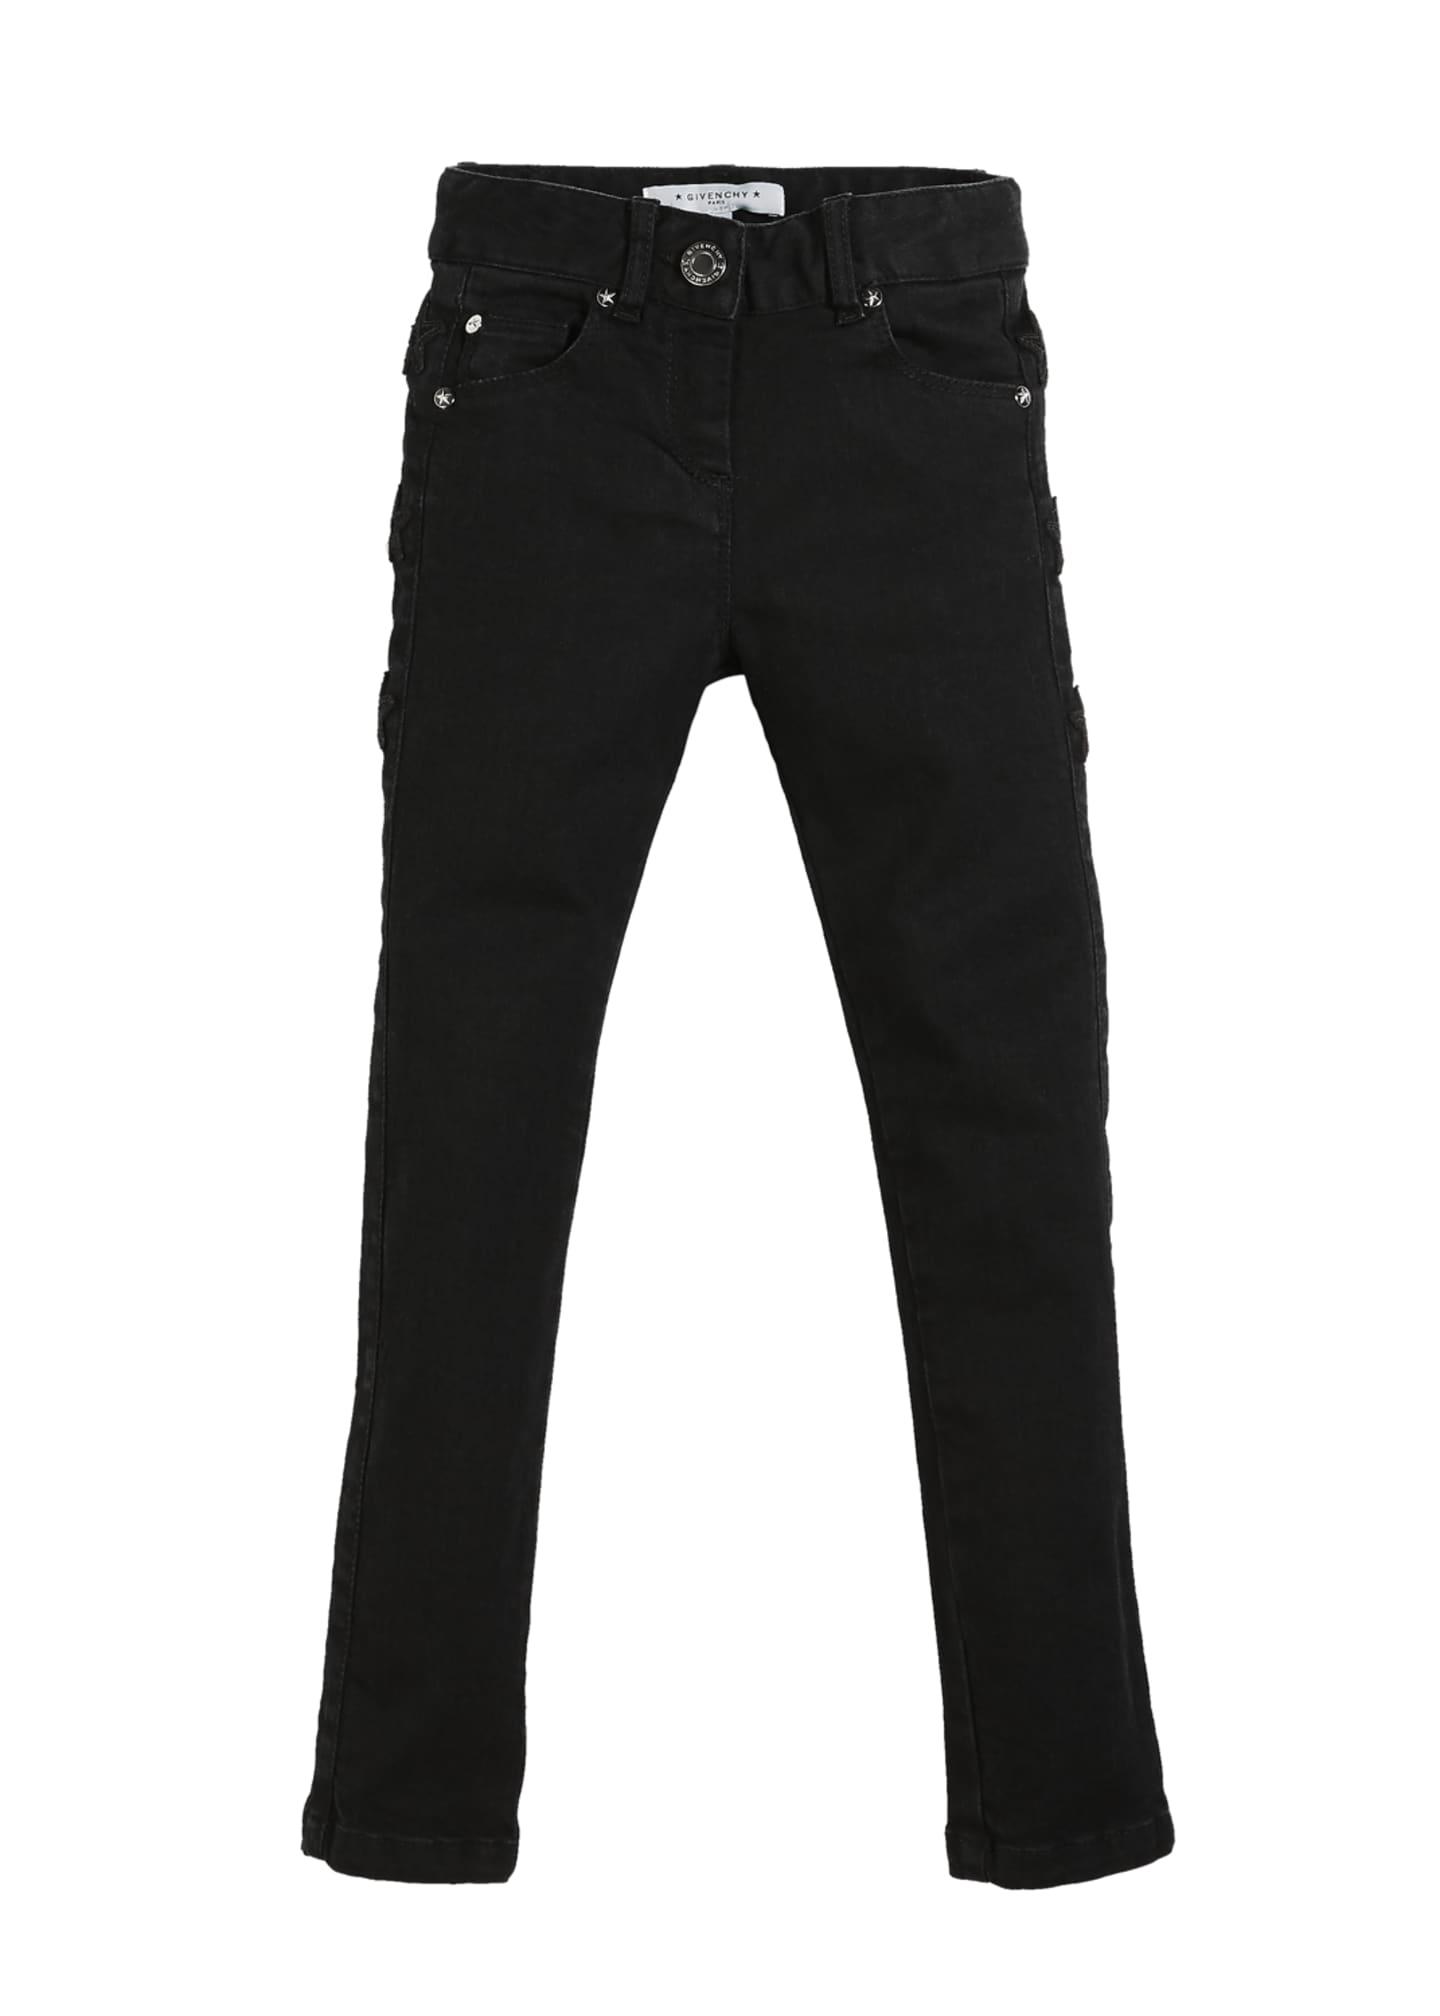 Givenchy Slim-Fit Leather-Trim Denim Pants, Size 12-14